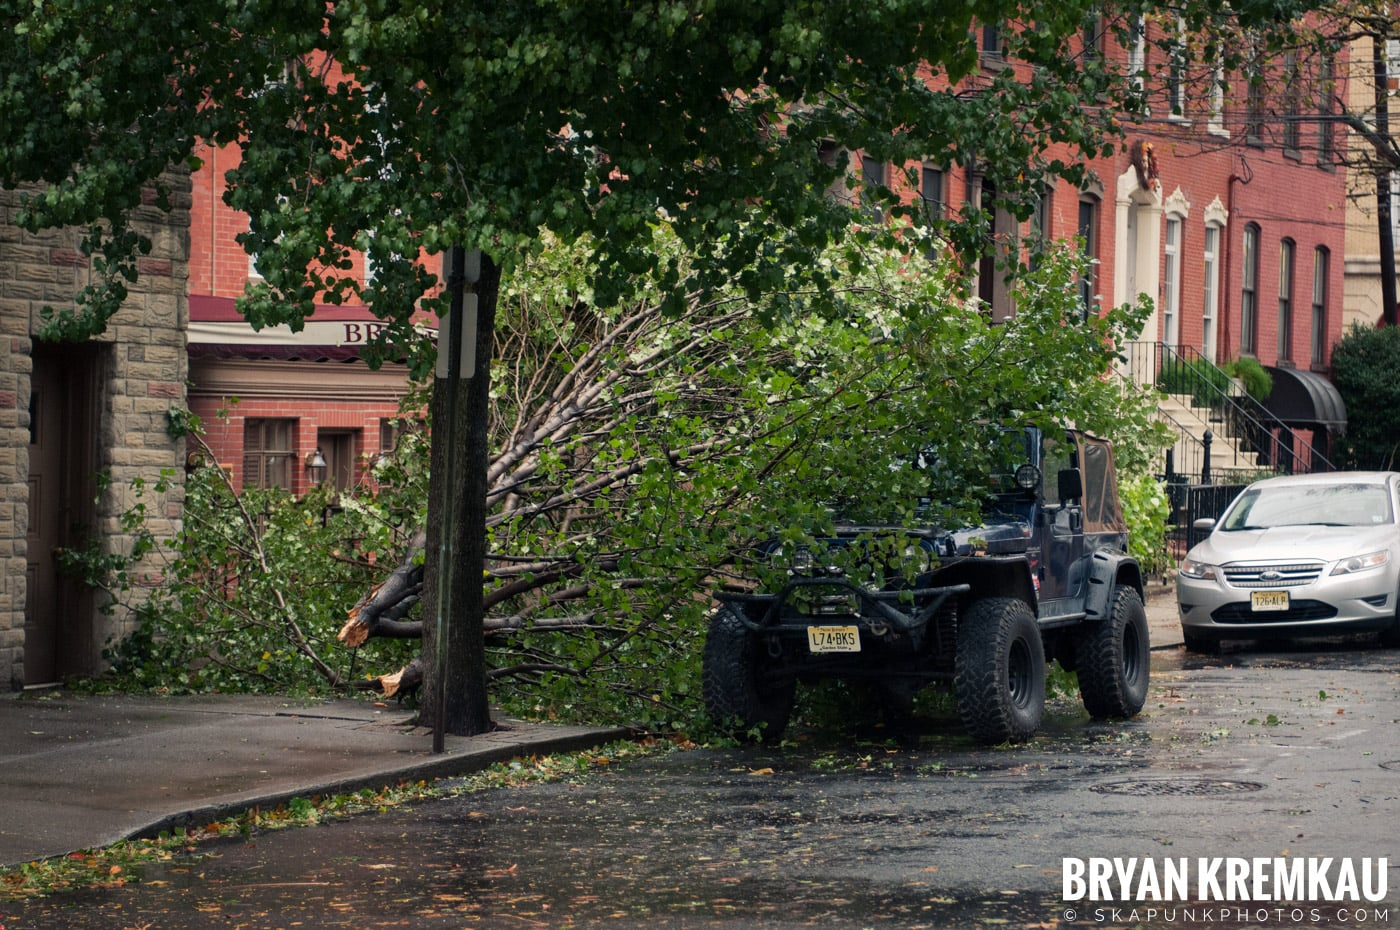 Hurricane Sandy 2012 @ Paulus Hook, Jersey City - 10.29.12 - 10.30.12 (34)